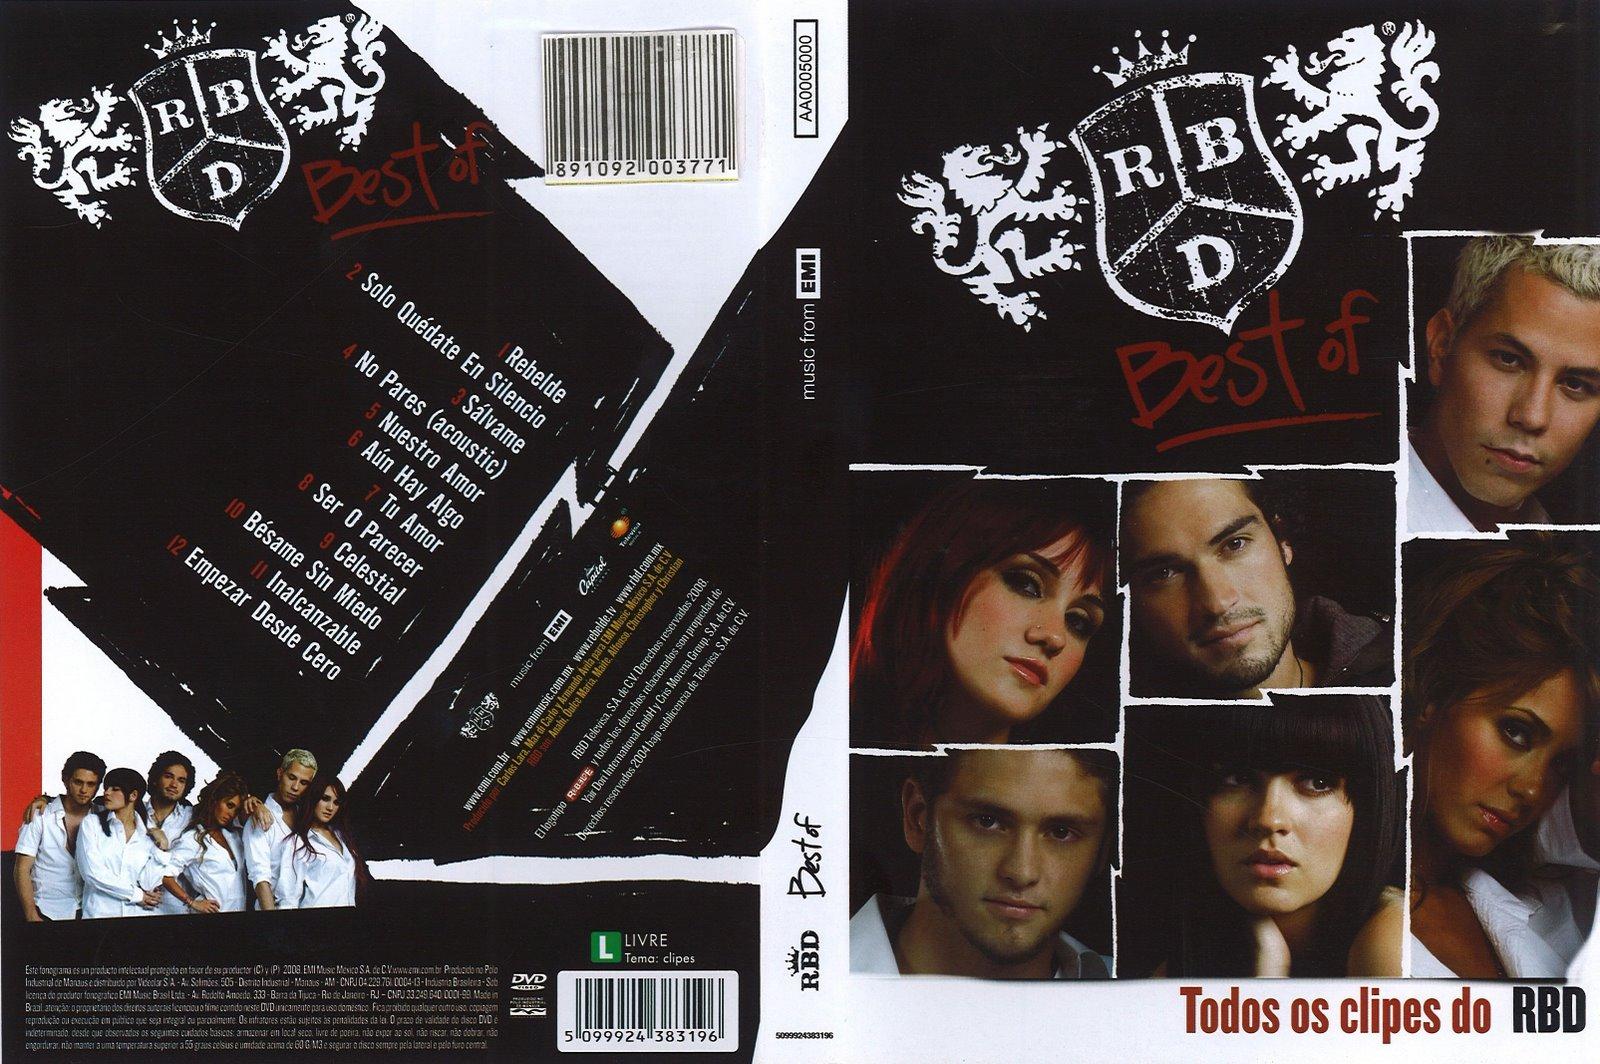 CD PARA MI DE O BAIXAR OLVIDARTE